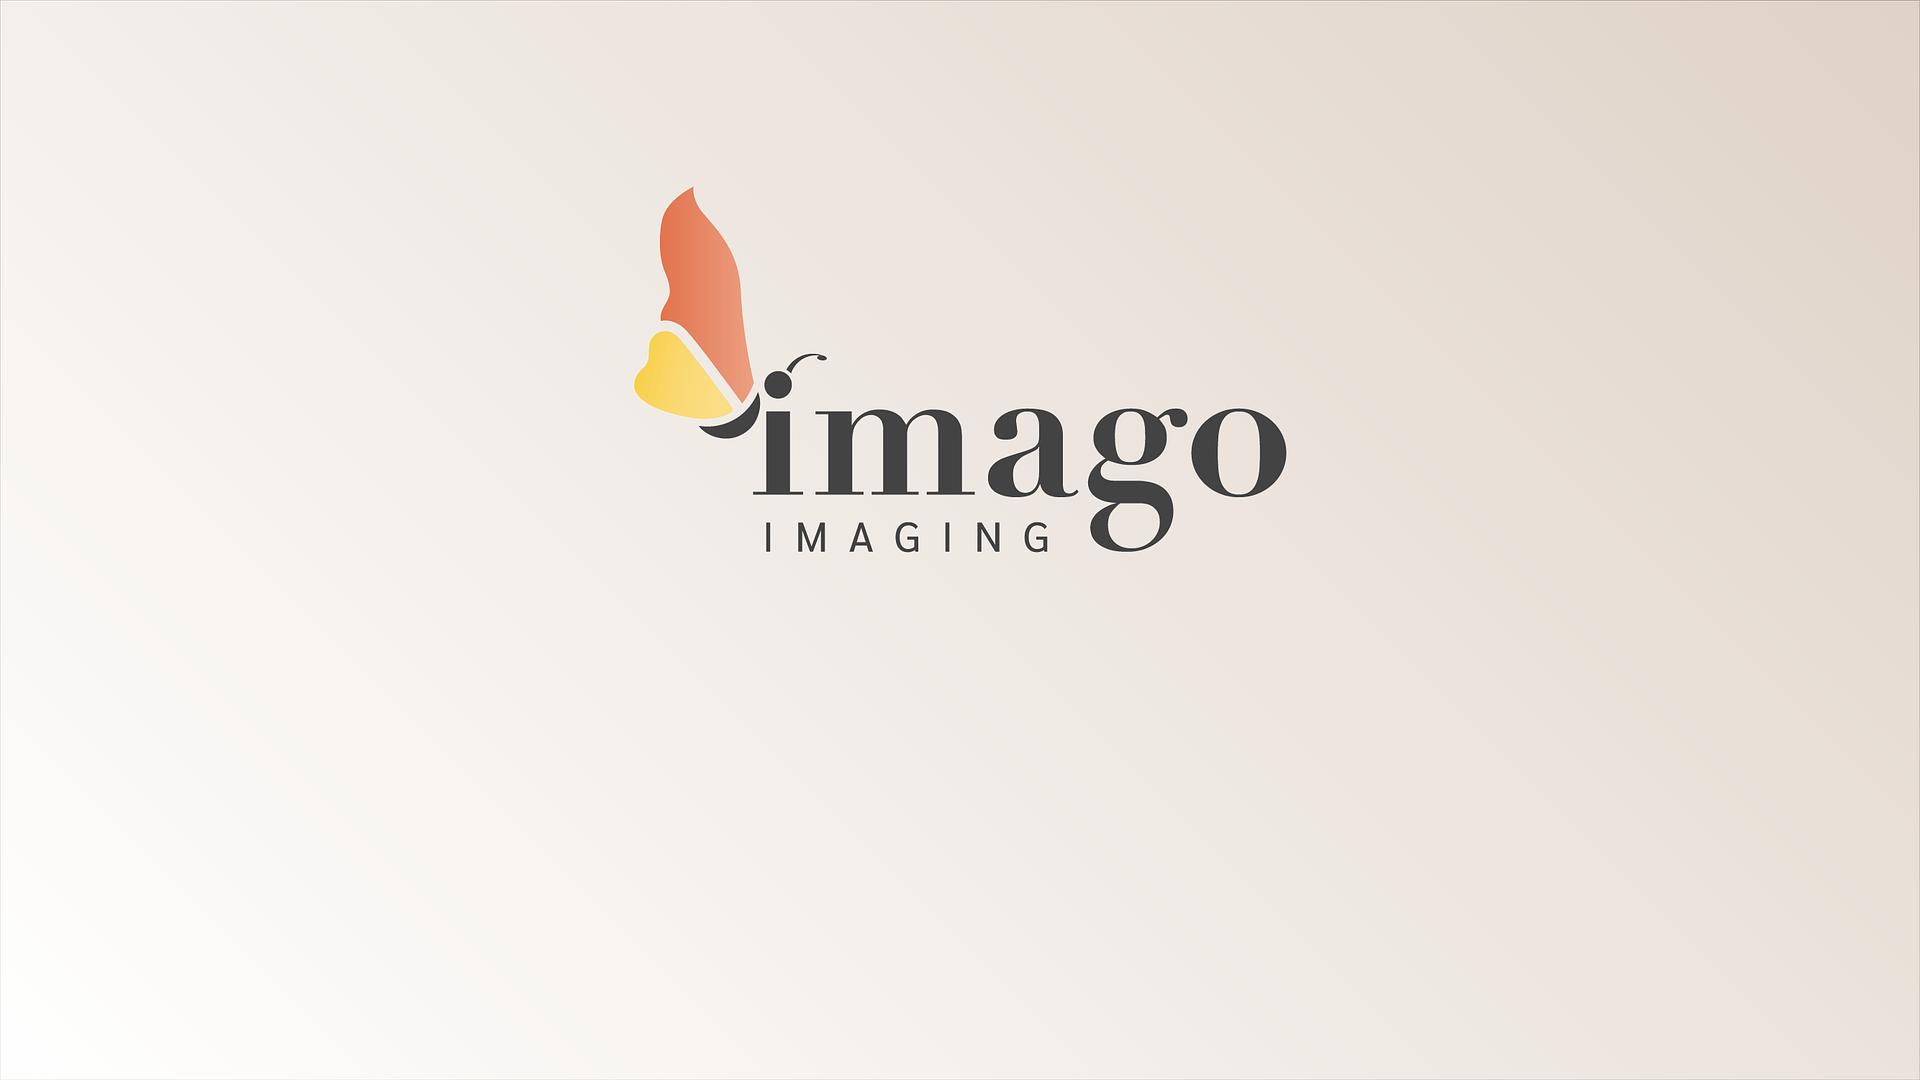 Imago Imaging logo on tan background